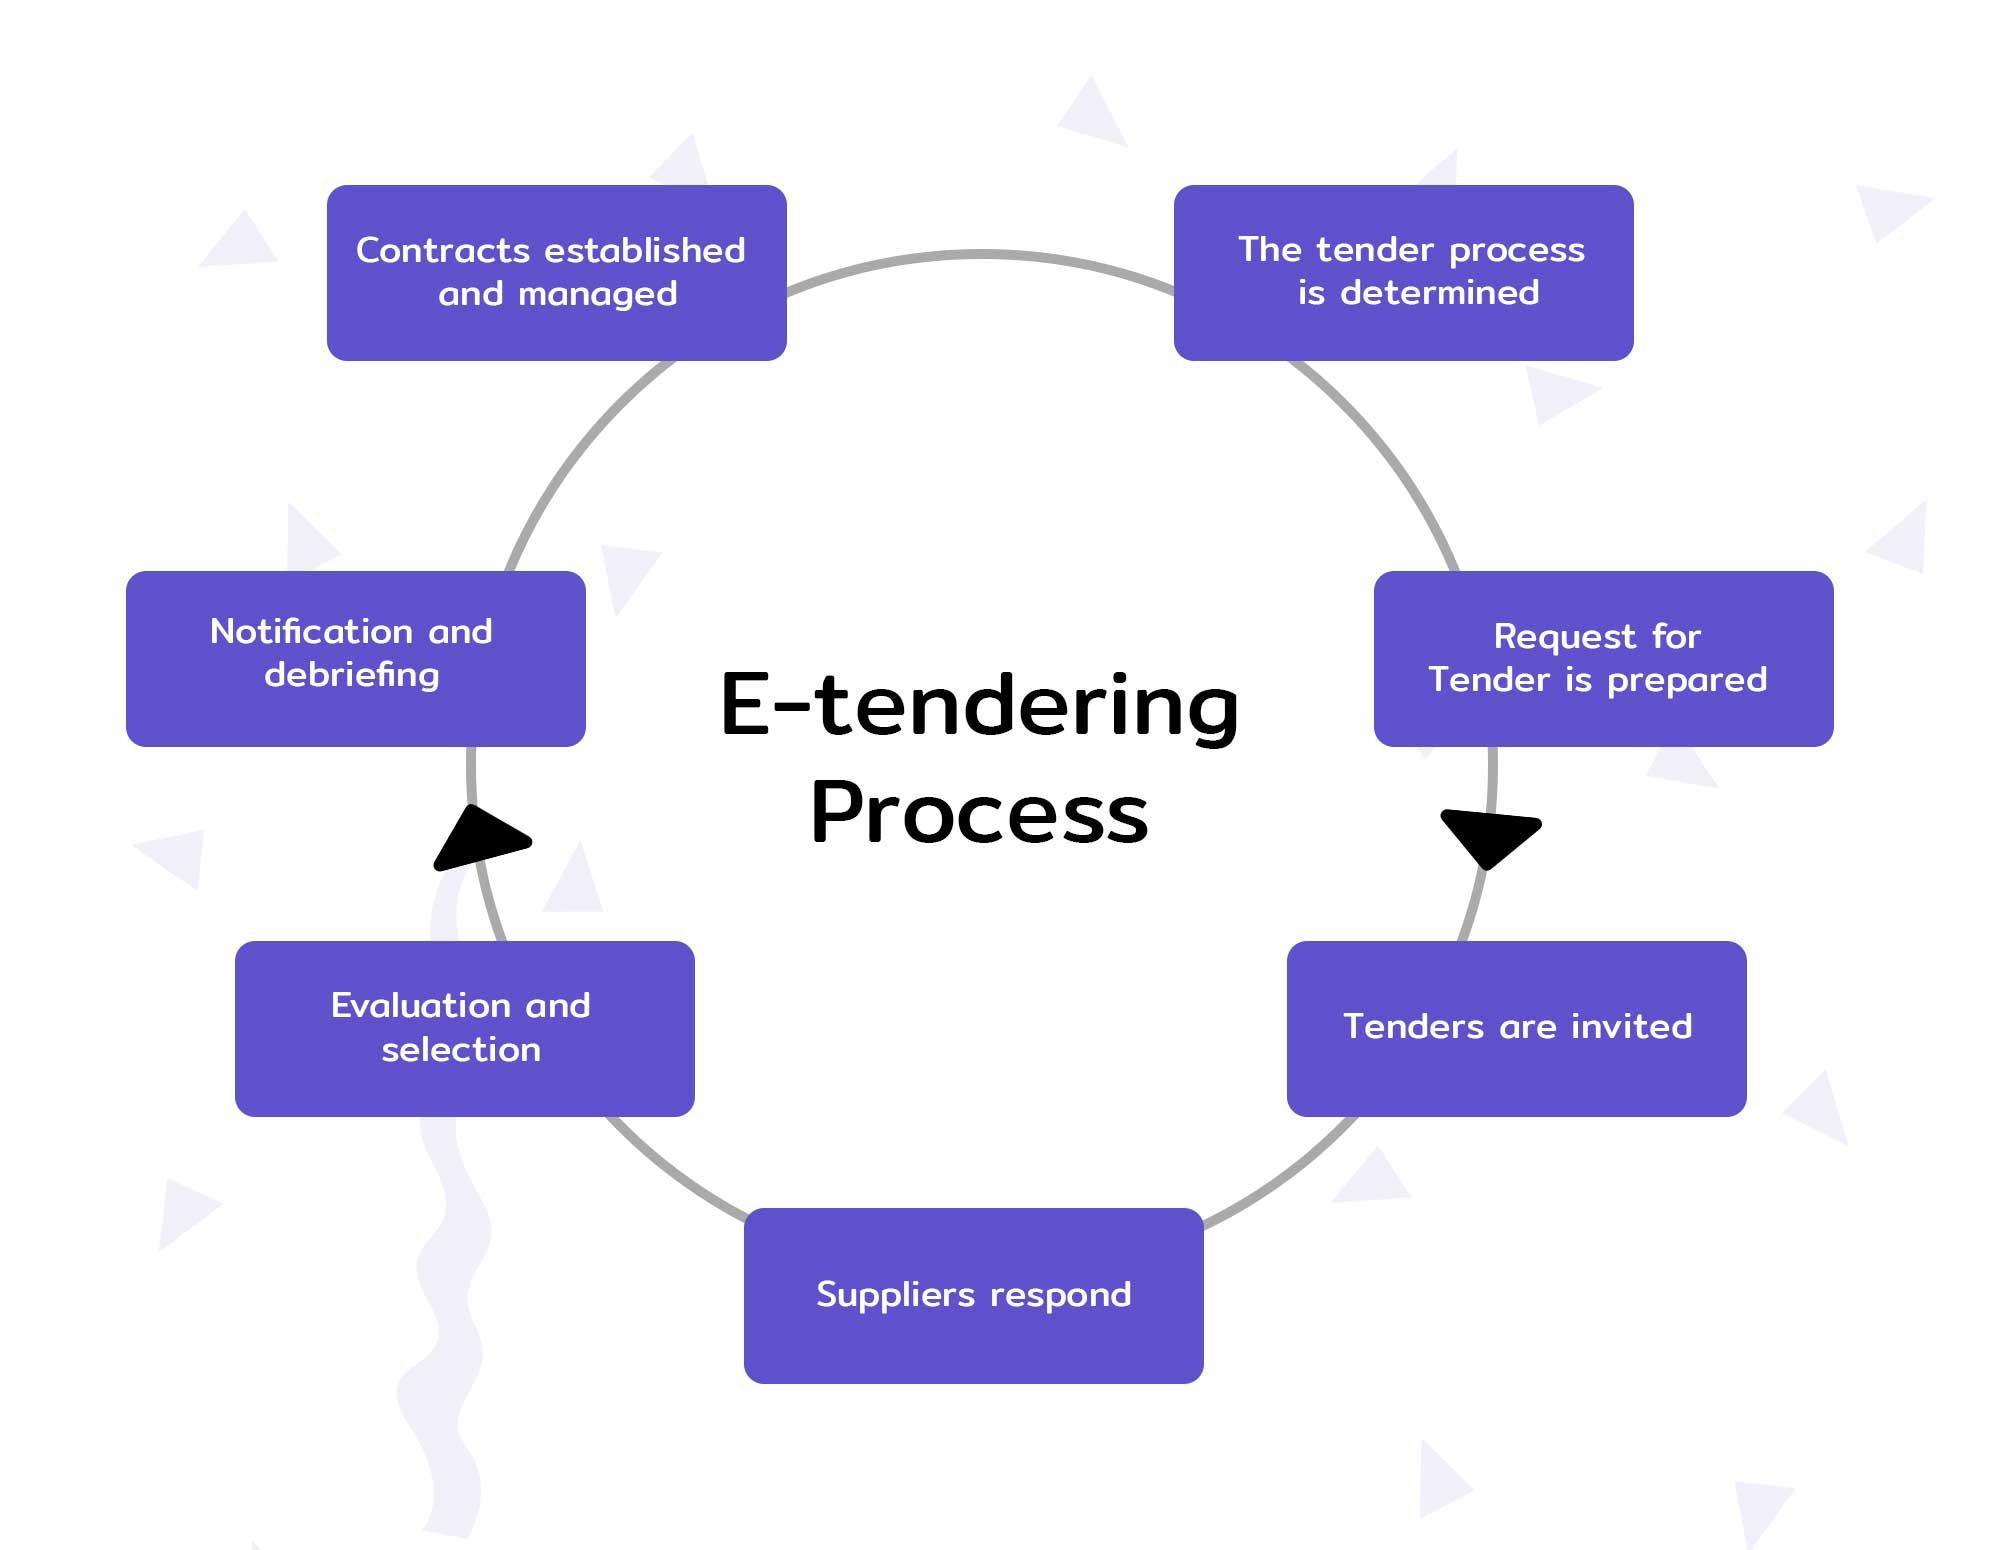 e-Tendering Process